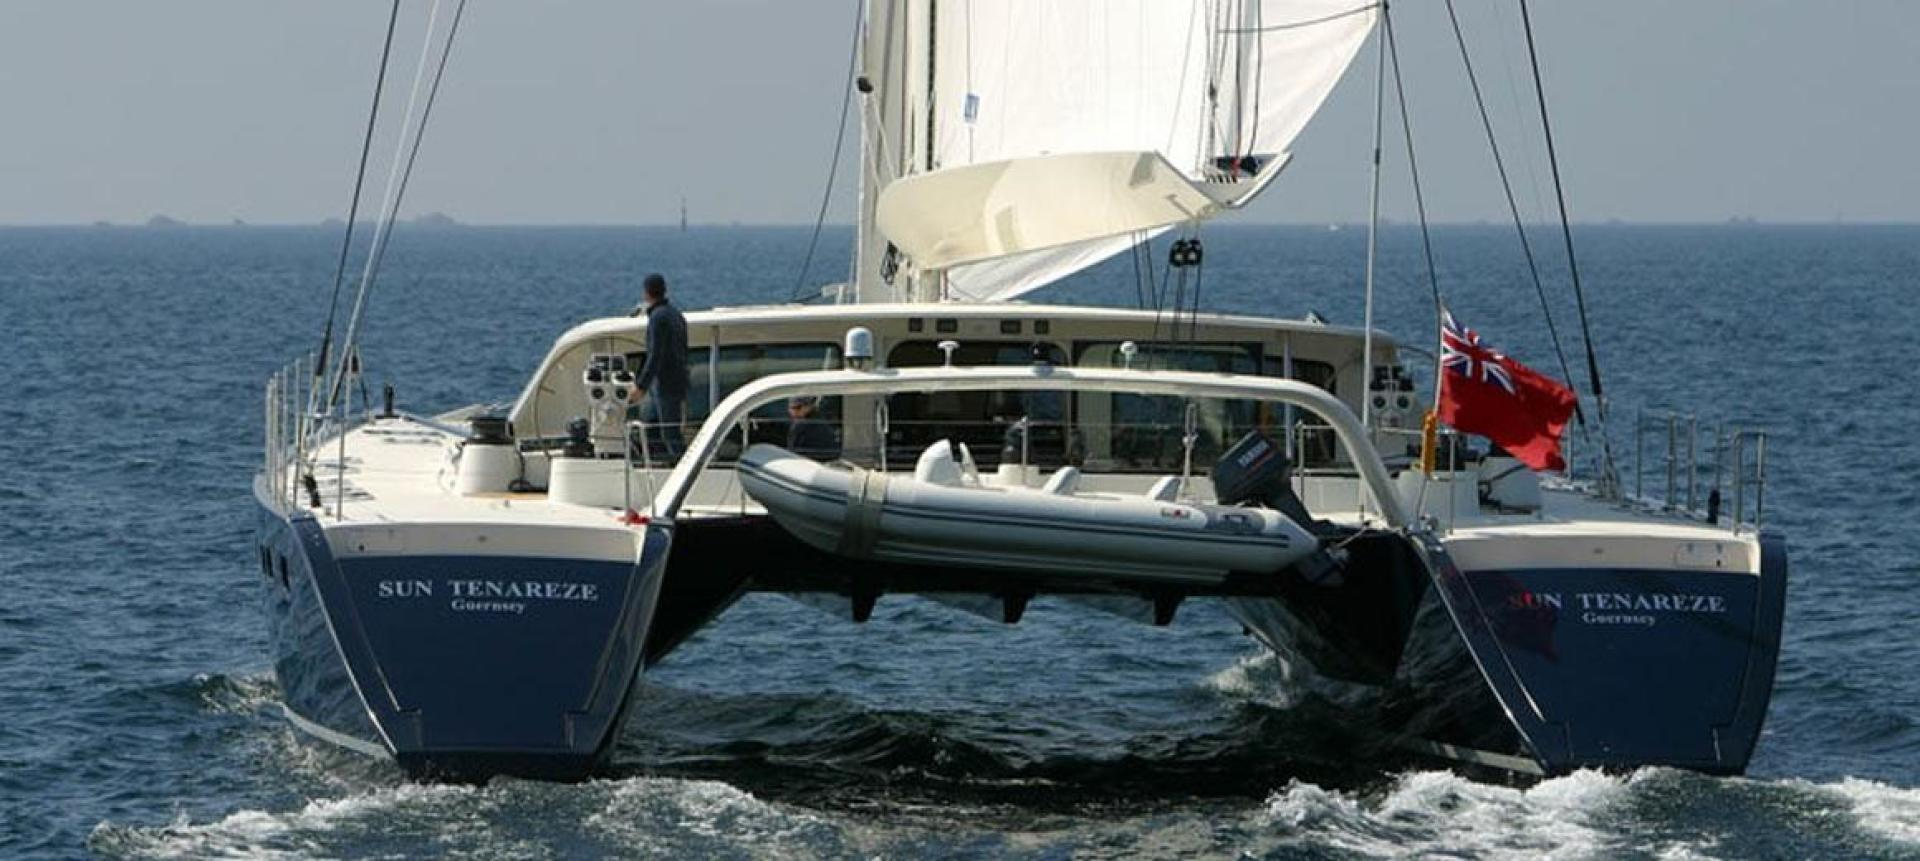 JFA-Catamaran 2004 -Miami-Florida-United States-1367449 | Thumbnail